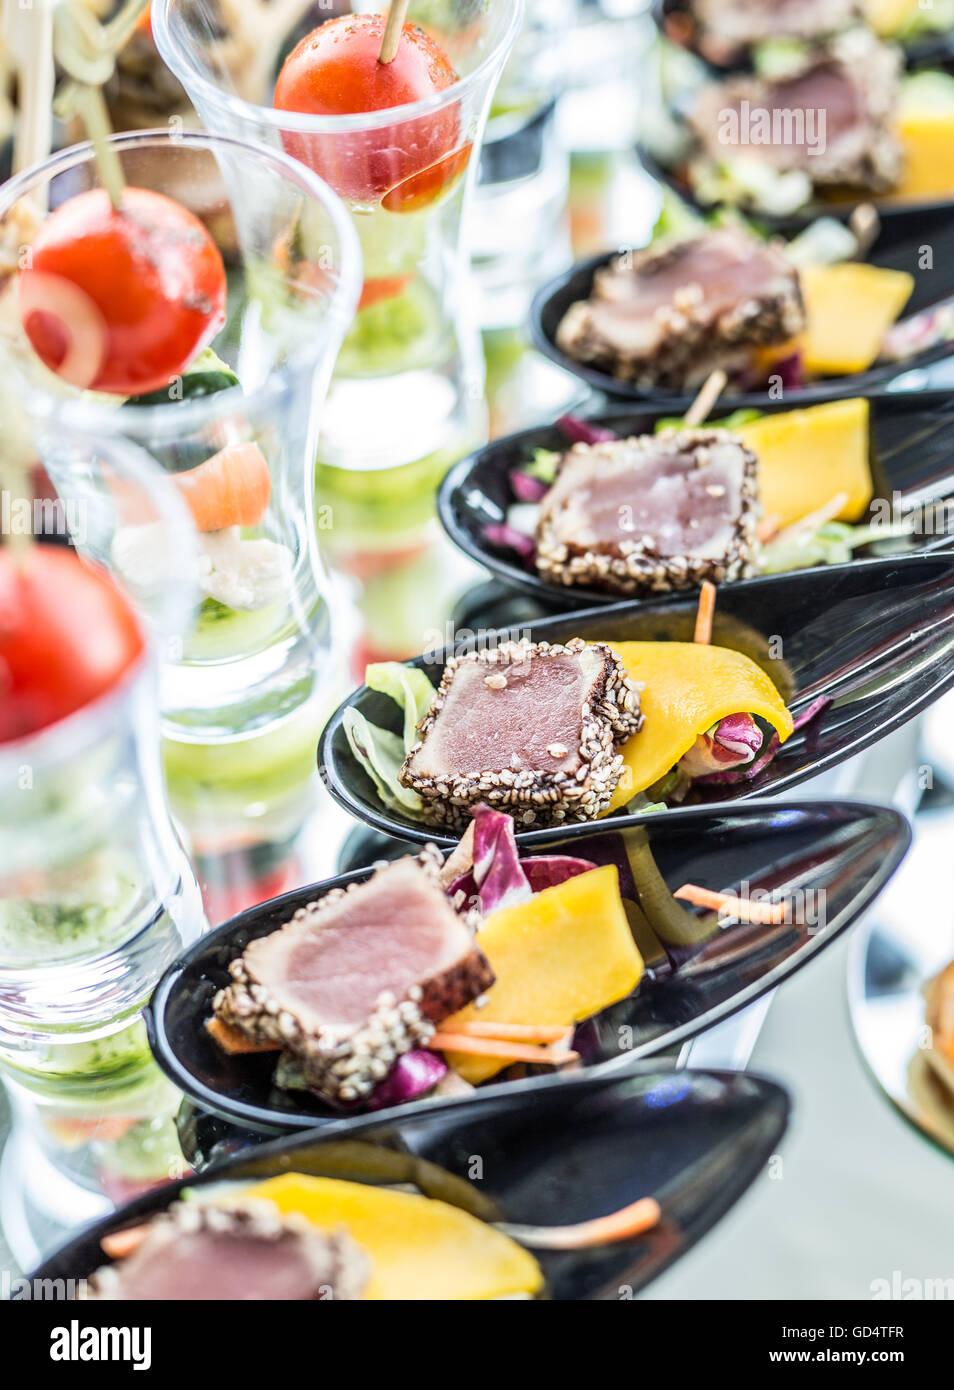 Assortment of canapés. Banquet service. Stock Photo